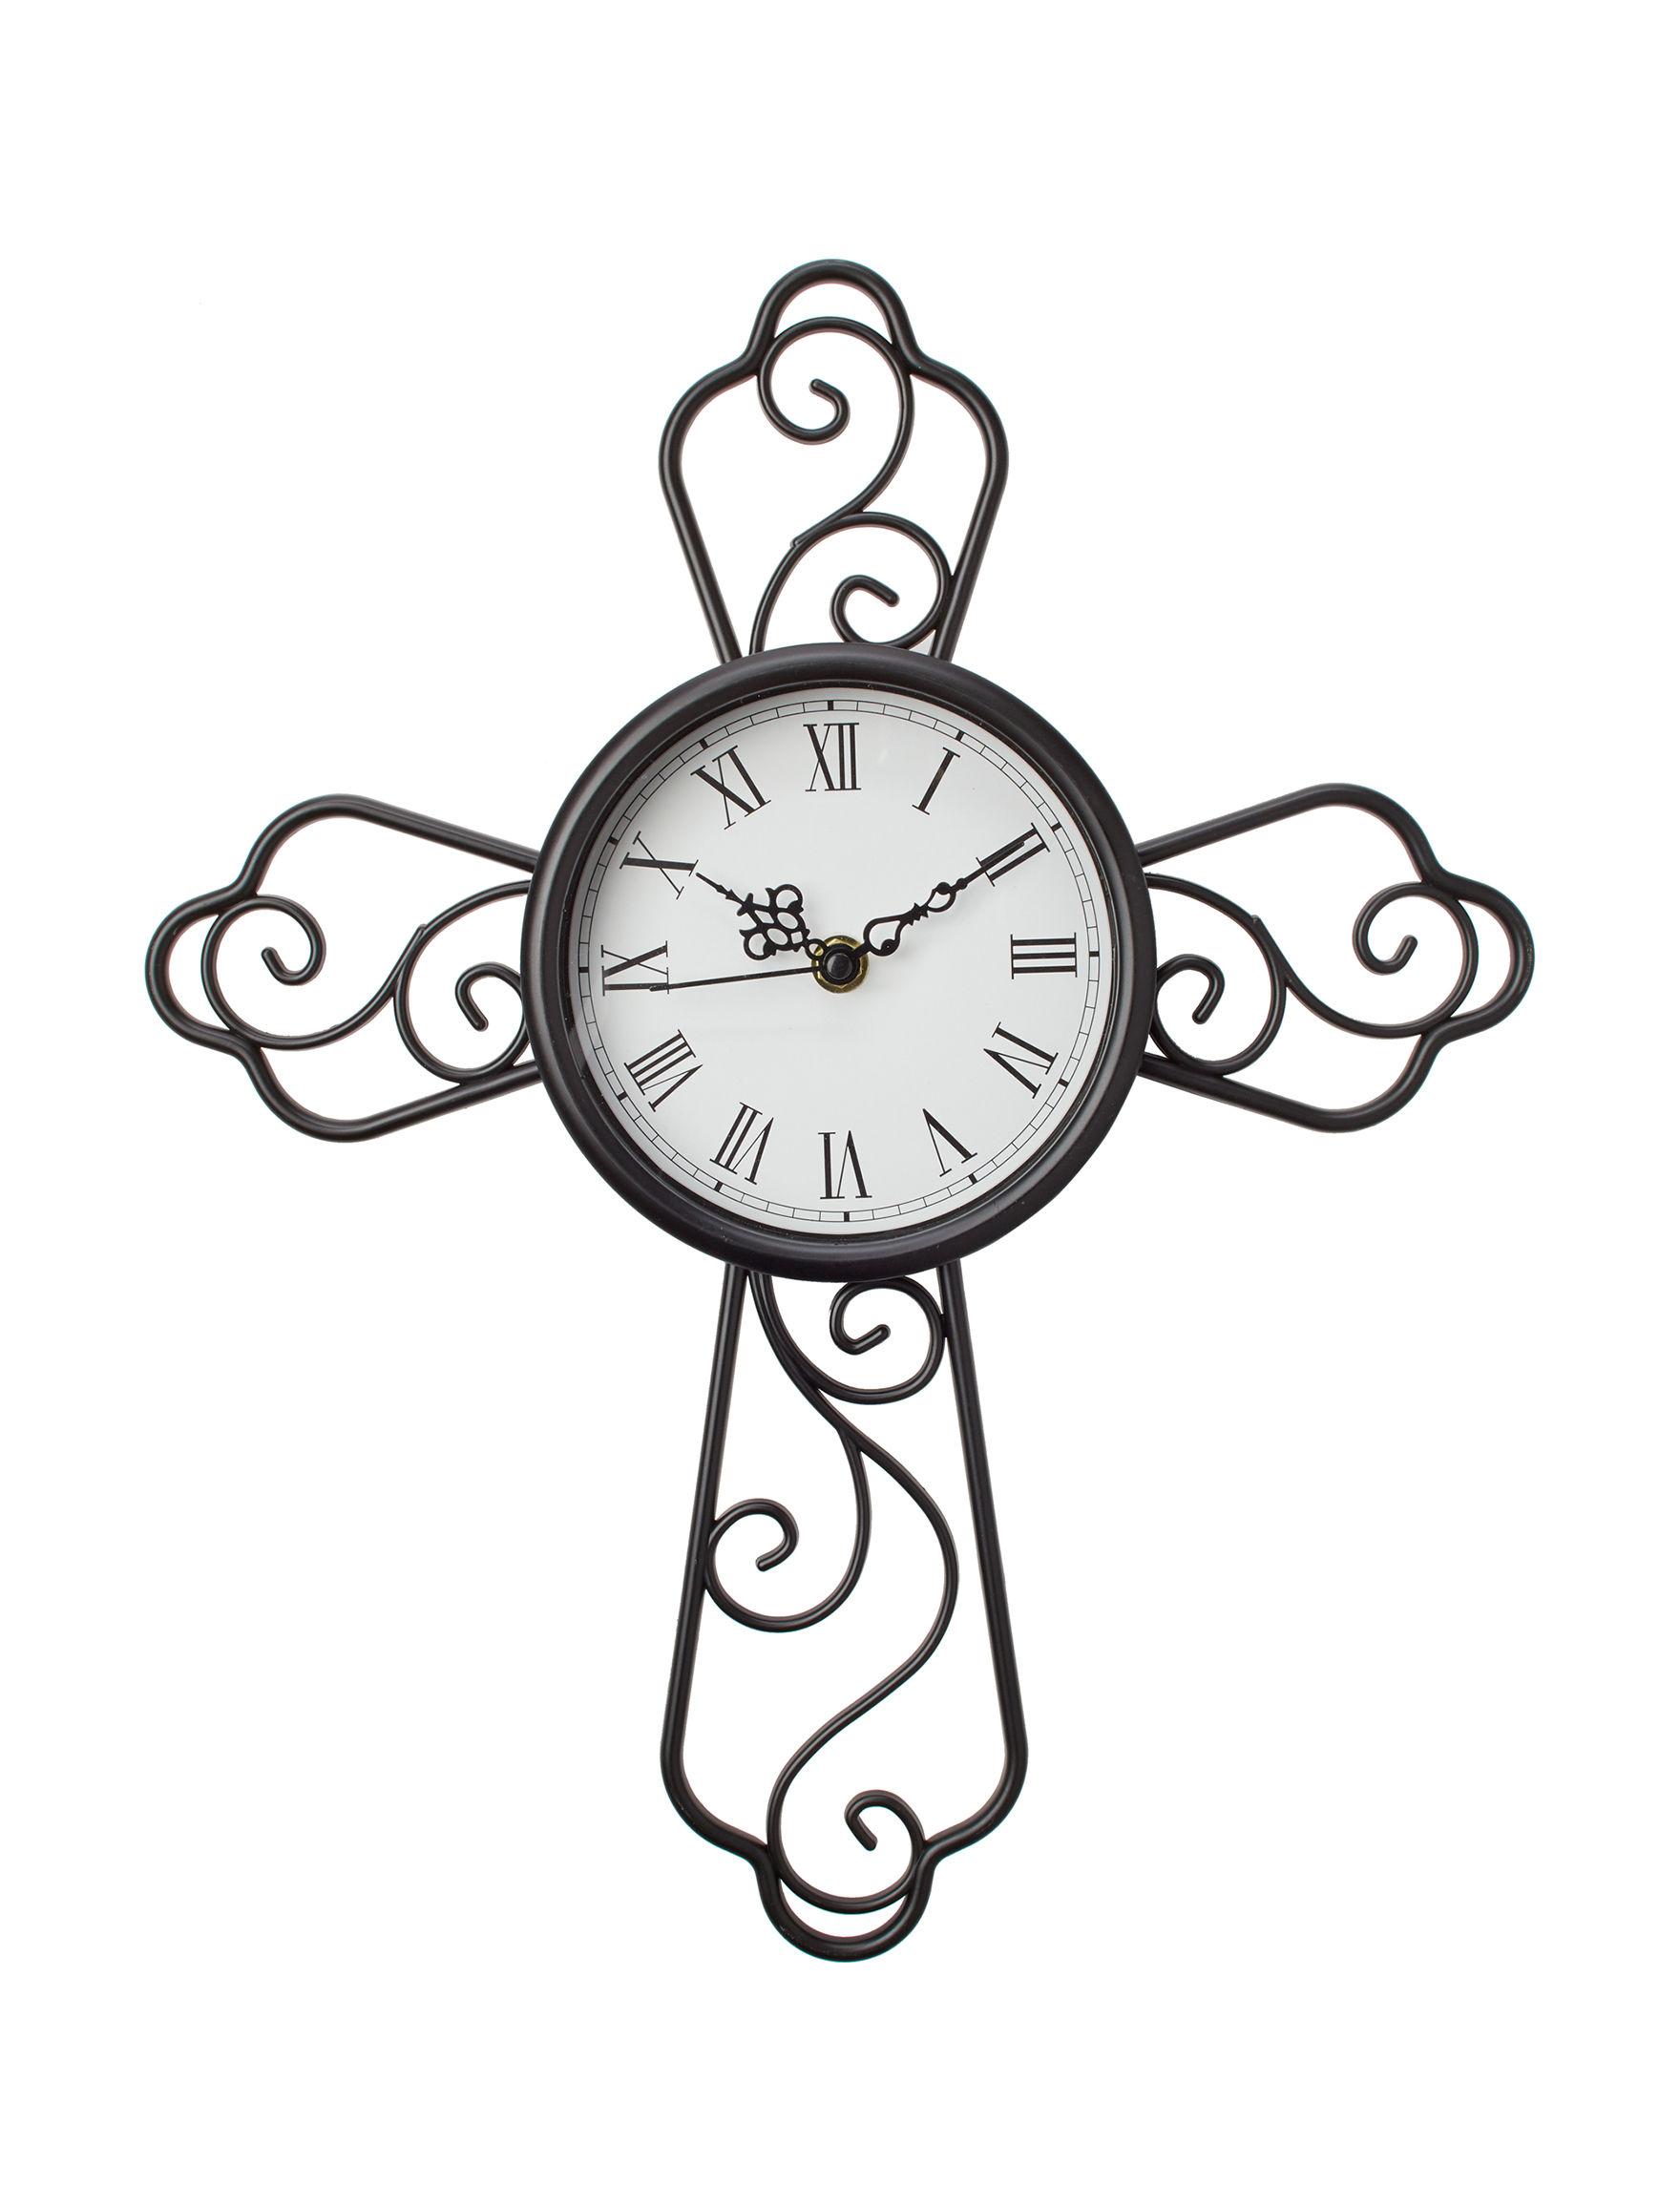 Crystal Art Gallery Black Wall Clocks Clocks Wall Decor